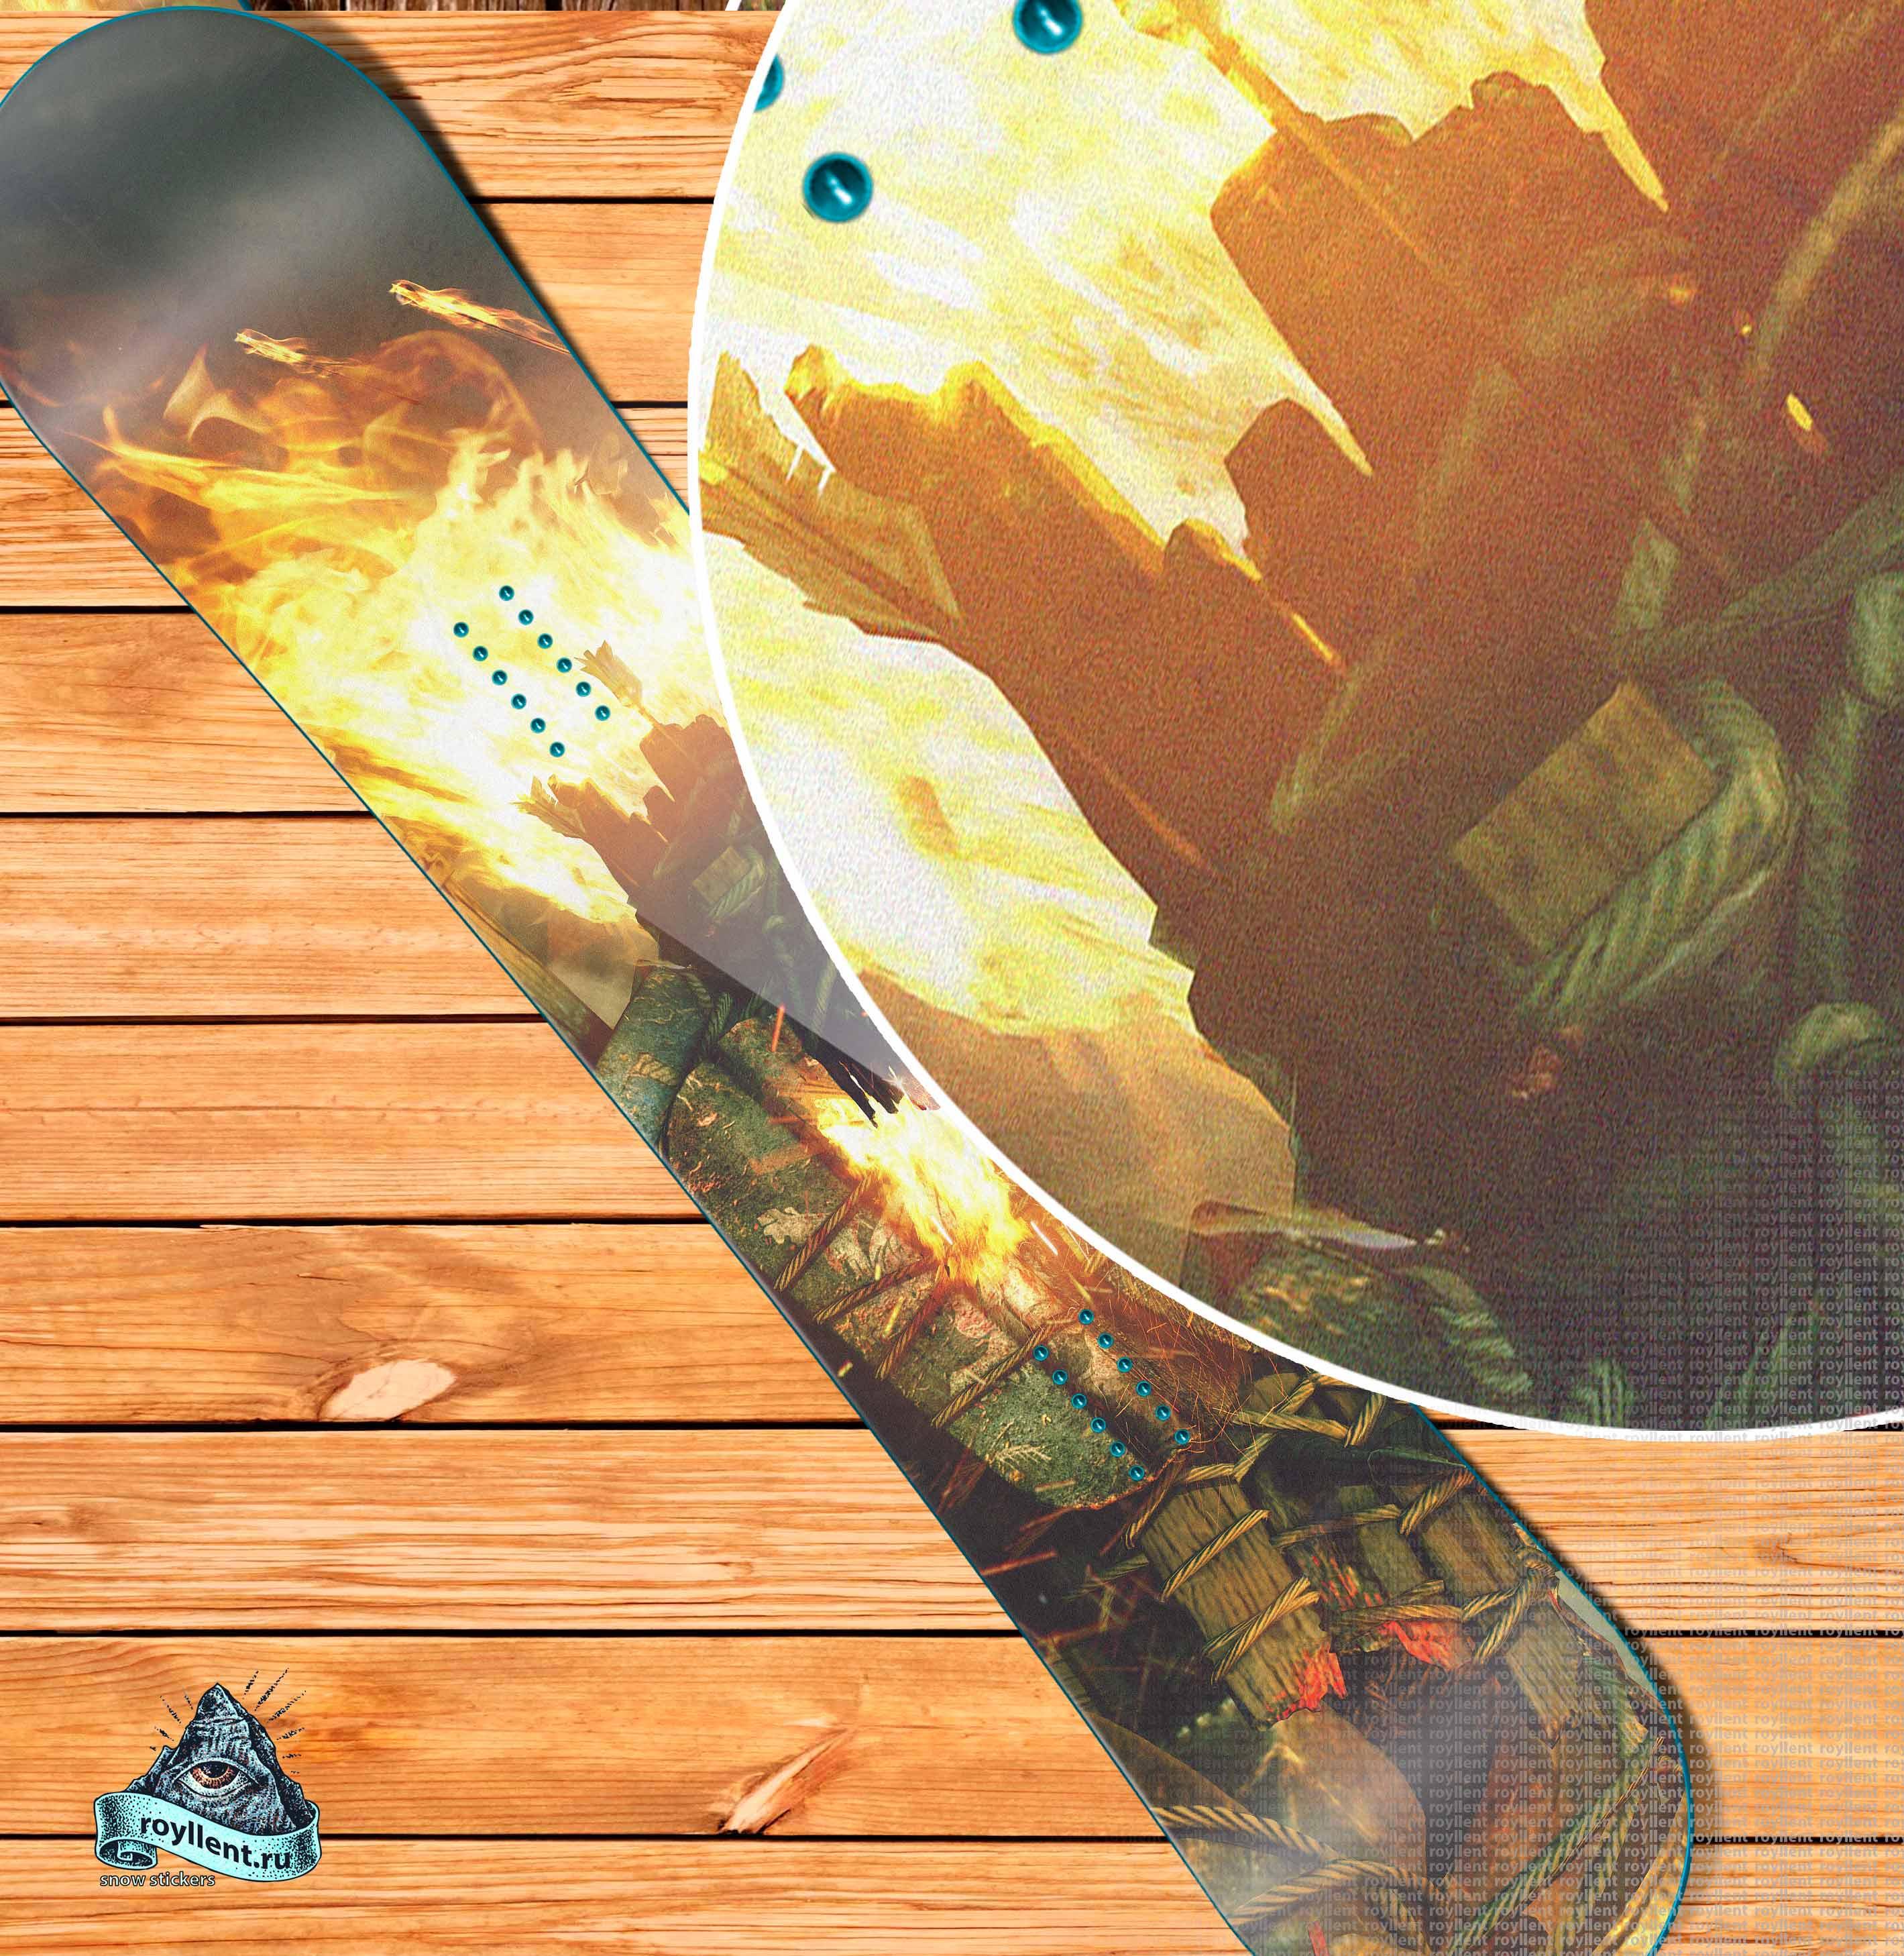 Наклейка The Witcher 2 Assassins of Kings, snowboard Game Design , наклейка The Witcher 2 Assassins of Kings Game Design , наклейка на доскуThe Witcher 2 Assassins of Kings Game Design, сноуборд наклейка The Witcher 2 Assassins of Kings Game Design, виниловая наклейка The Witcher 2 Assassins of Kings Game Design , магазин наклеек The Witcher 2 Assassins of Kings Game Design, купить наклейку The Witcher 2 Assassins of Kings, стикер The Witcher 2 Assassins of Kings, sticker The Witcher 2 Assassins of Kings, наклейка The Witcher 2 Assassins of Kings, снежком, кировск